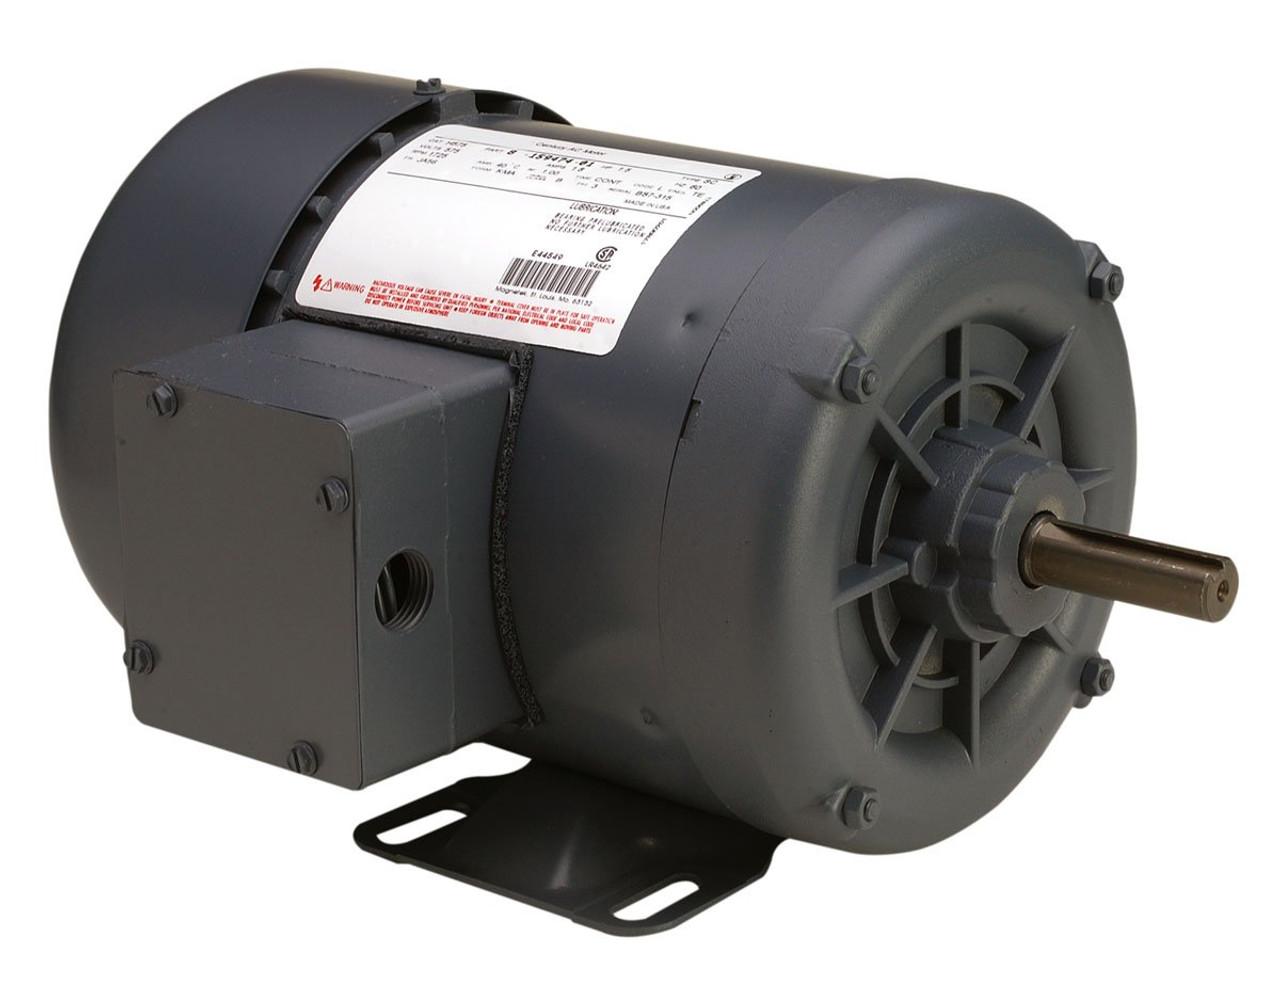 H505__04150.1467827232?c=2 te108 three phase tefc general purpose motor 1 5 hp csh electric